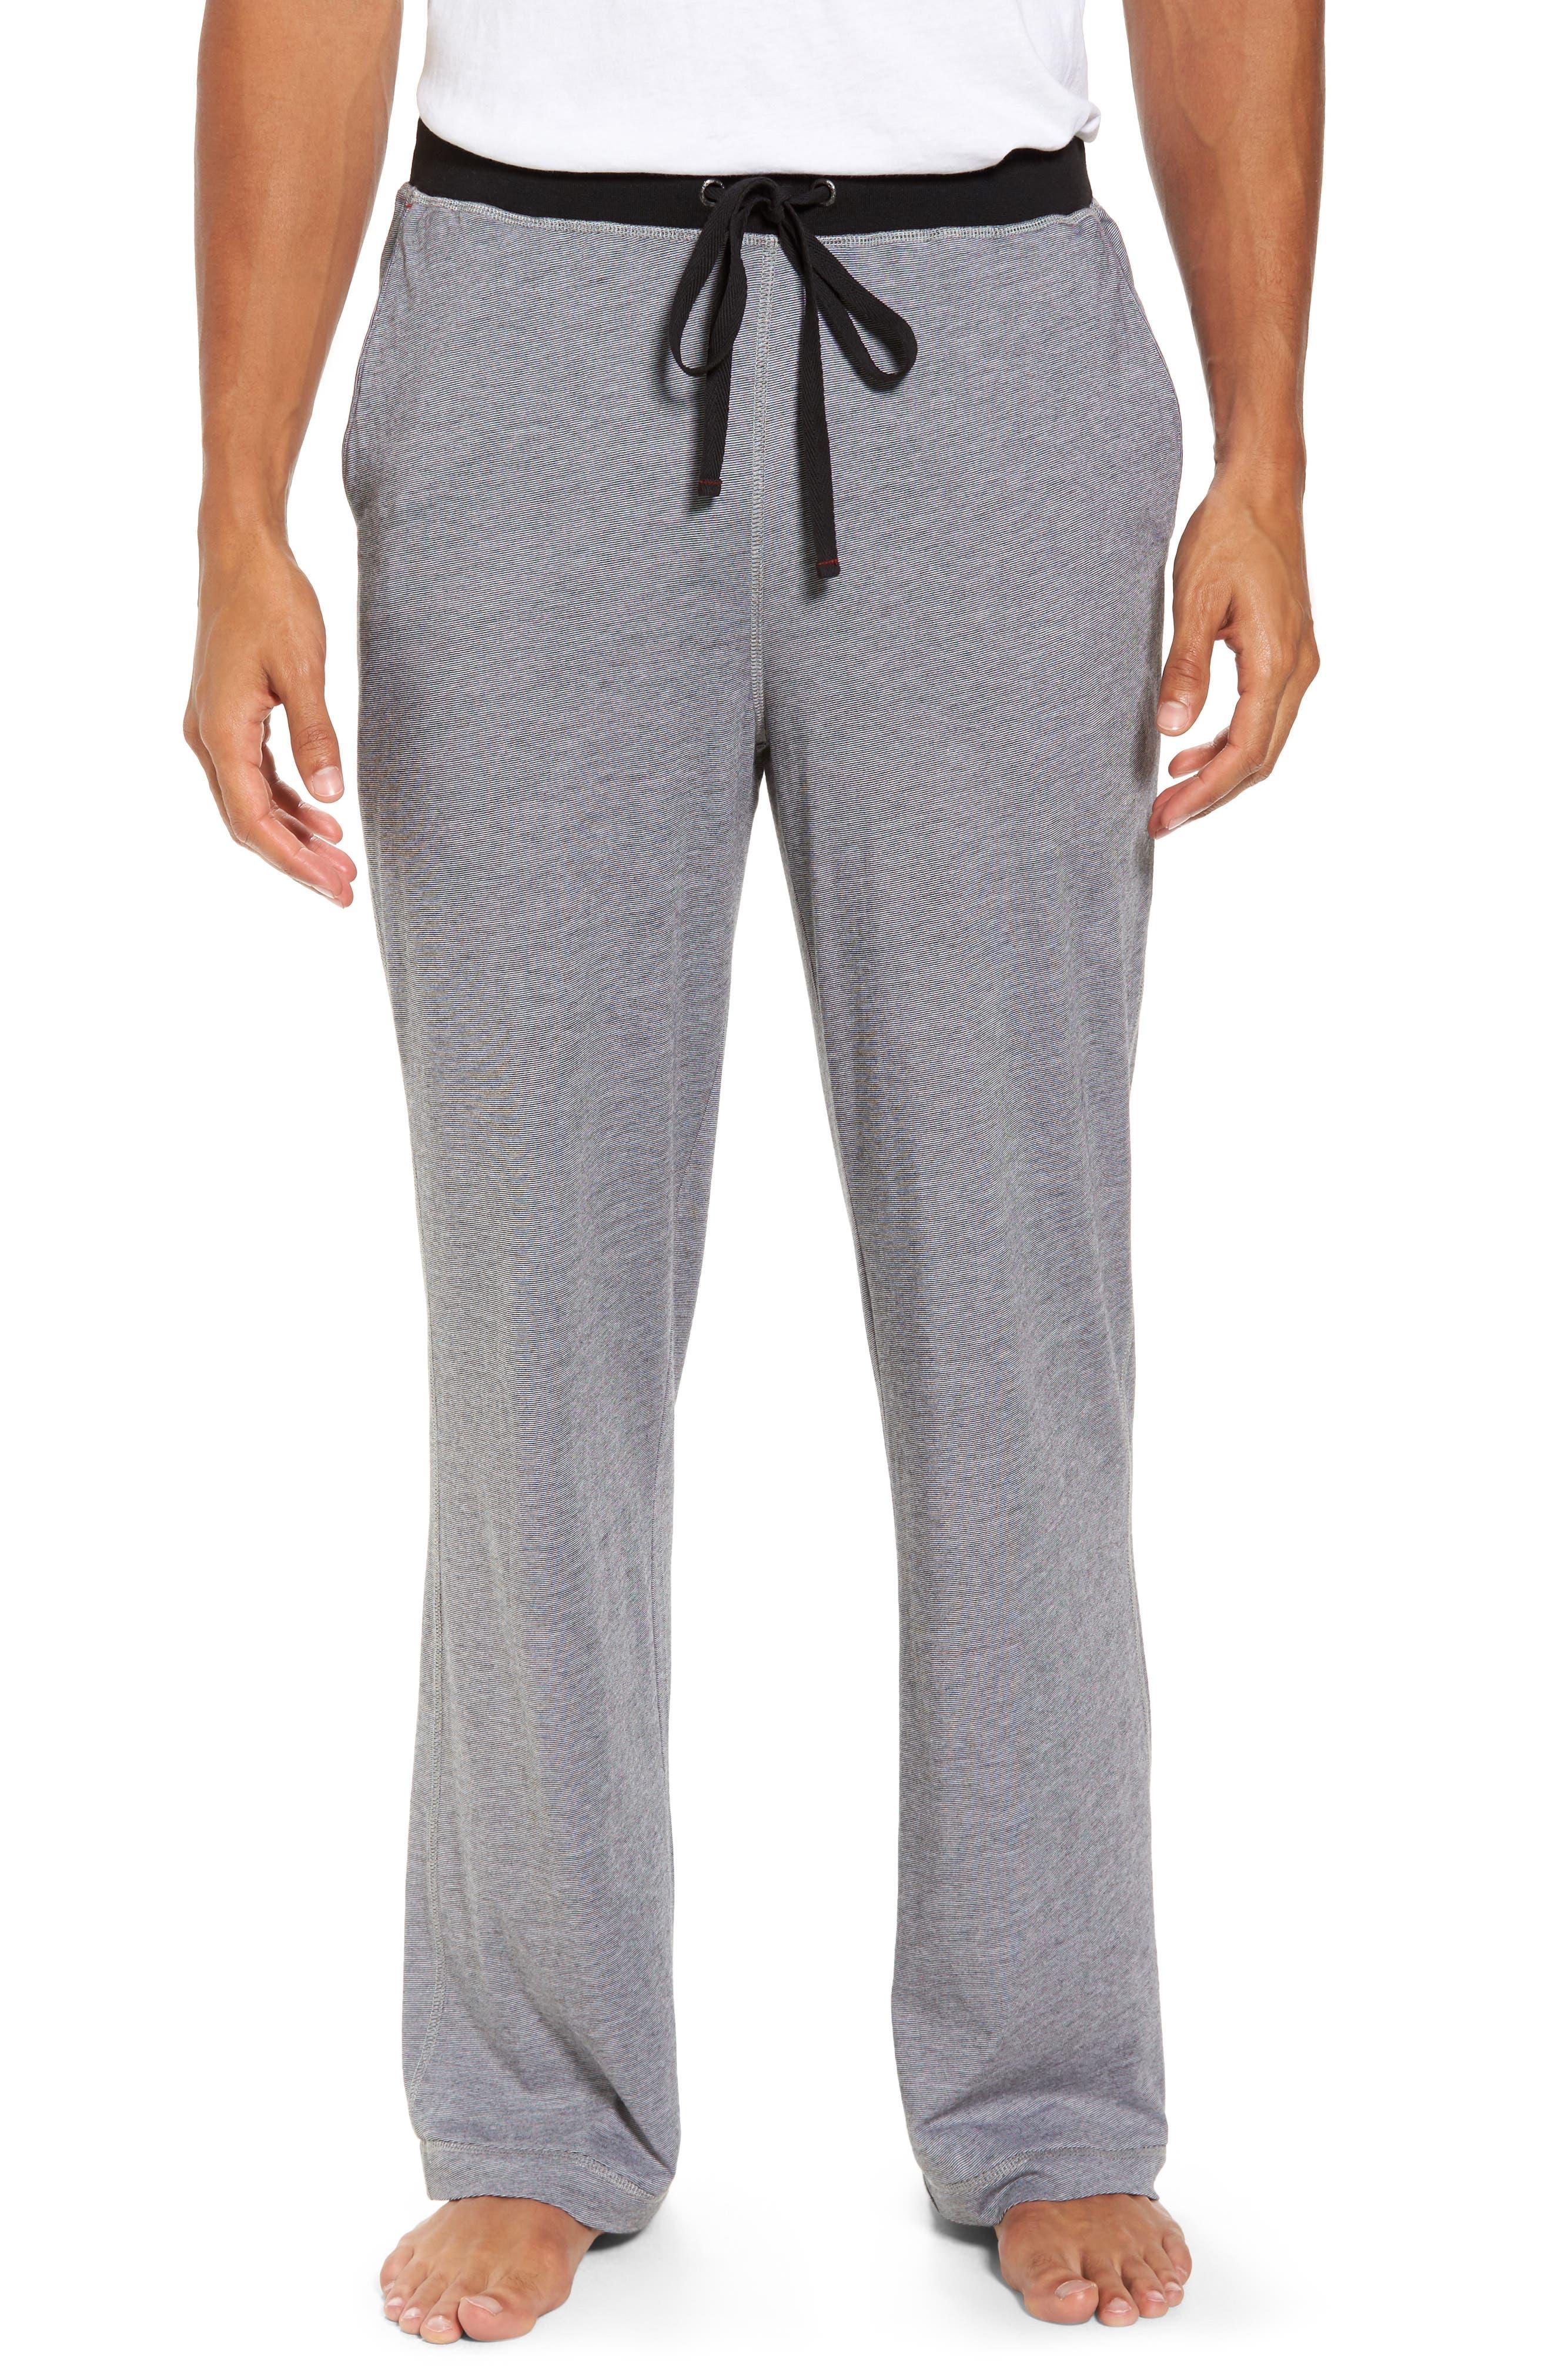 Pima Cotton & Modal Lounge Pants,                             Main thumbnail 1, color,                             001